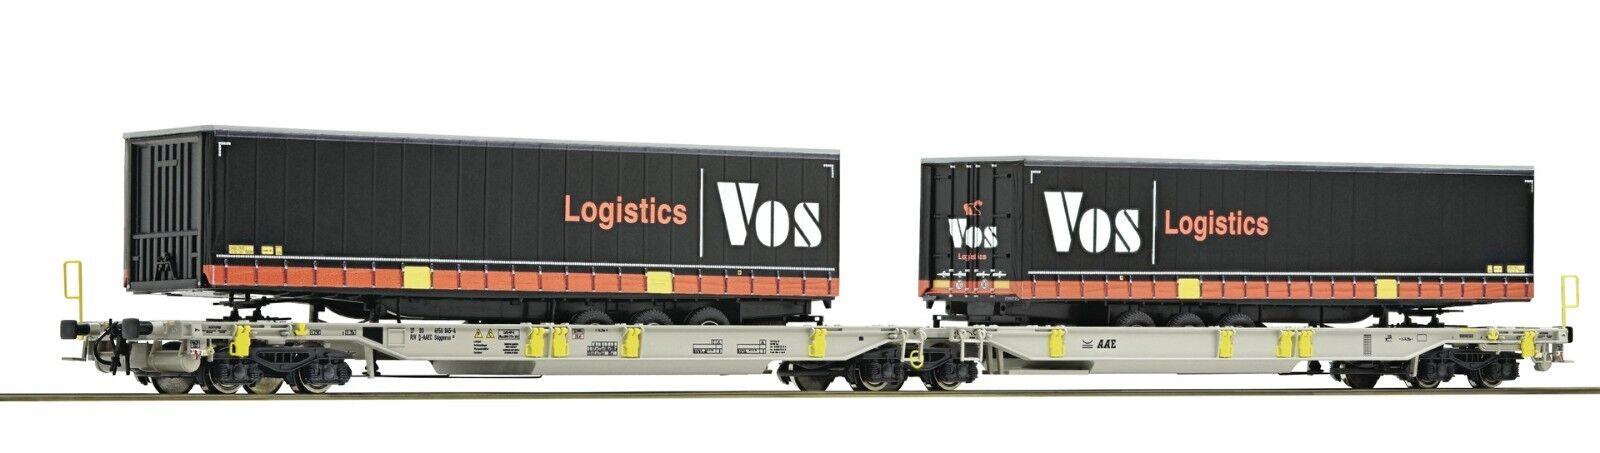 Roco 76417, h0 doppetragwagen t2000, vos logostik, nuevo, embalaje original